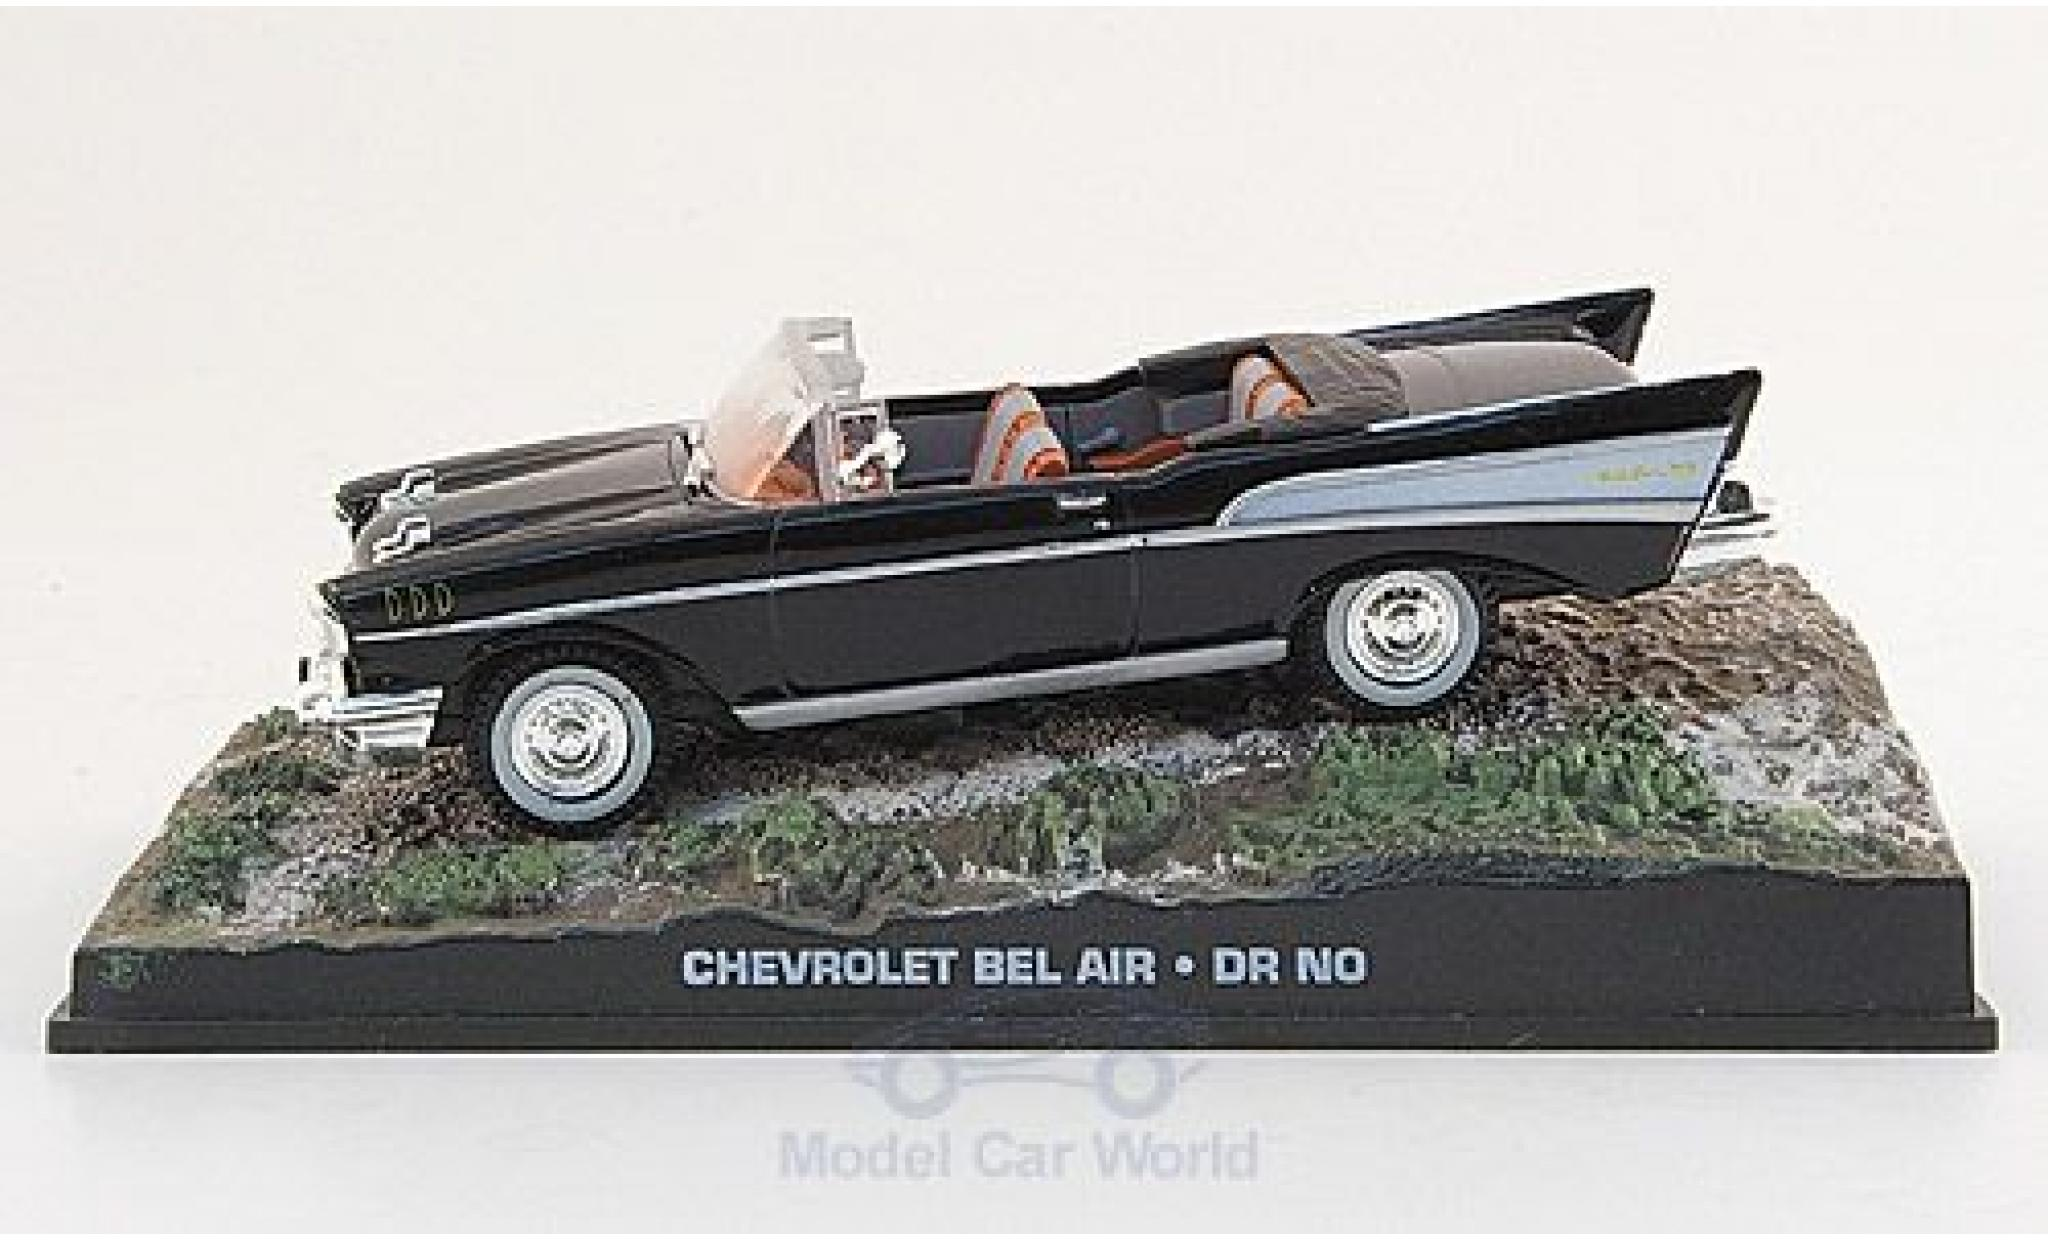 Chevrolet Bel Air 1/43 SpecialC 007 black James Bond 007 1962 James Bond jagt Dr.No ohne Vitrine